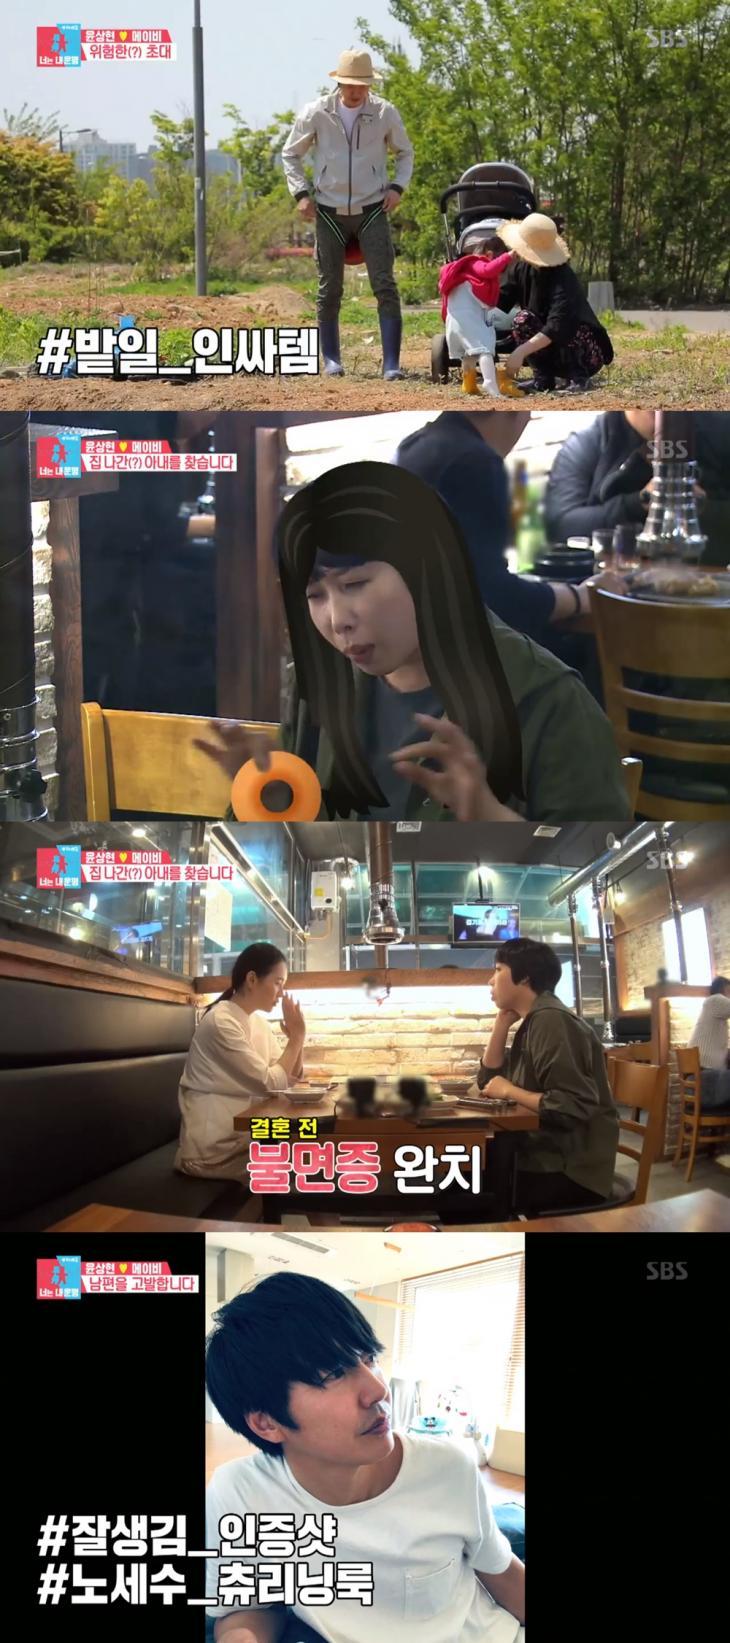 SBS '동상이몽2-너는 내 운명' 방송 캡쳐